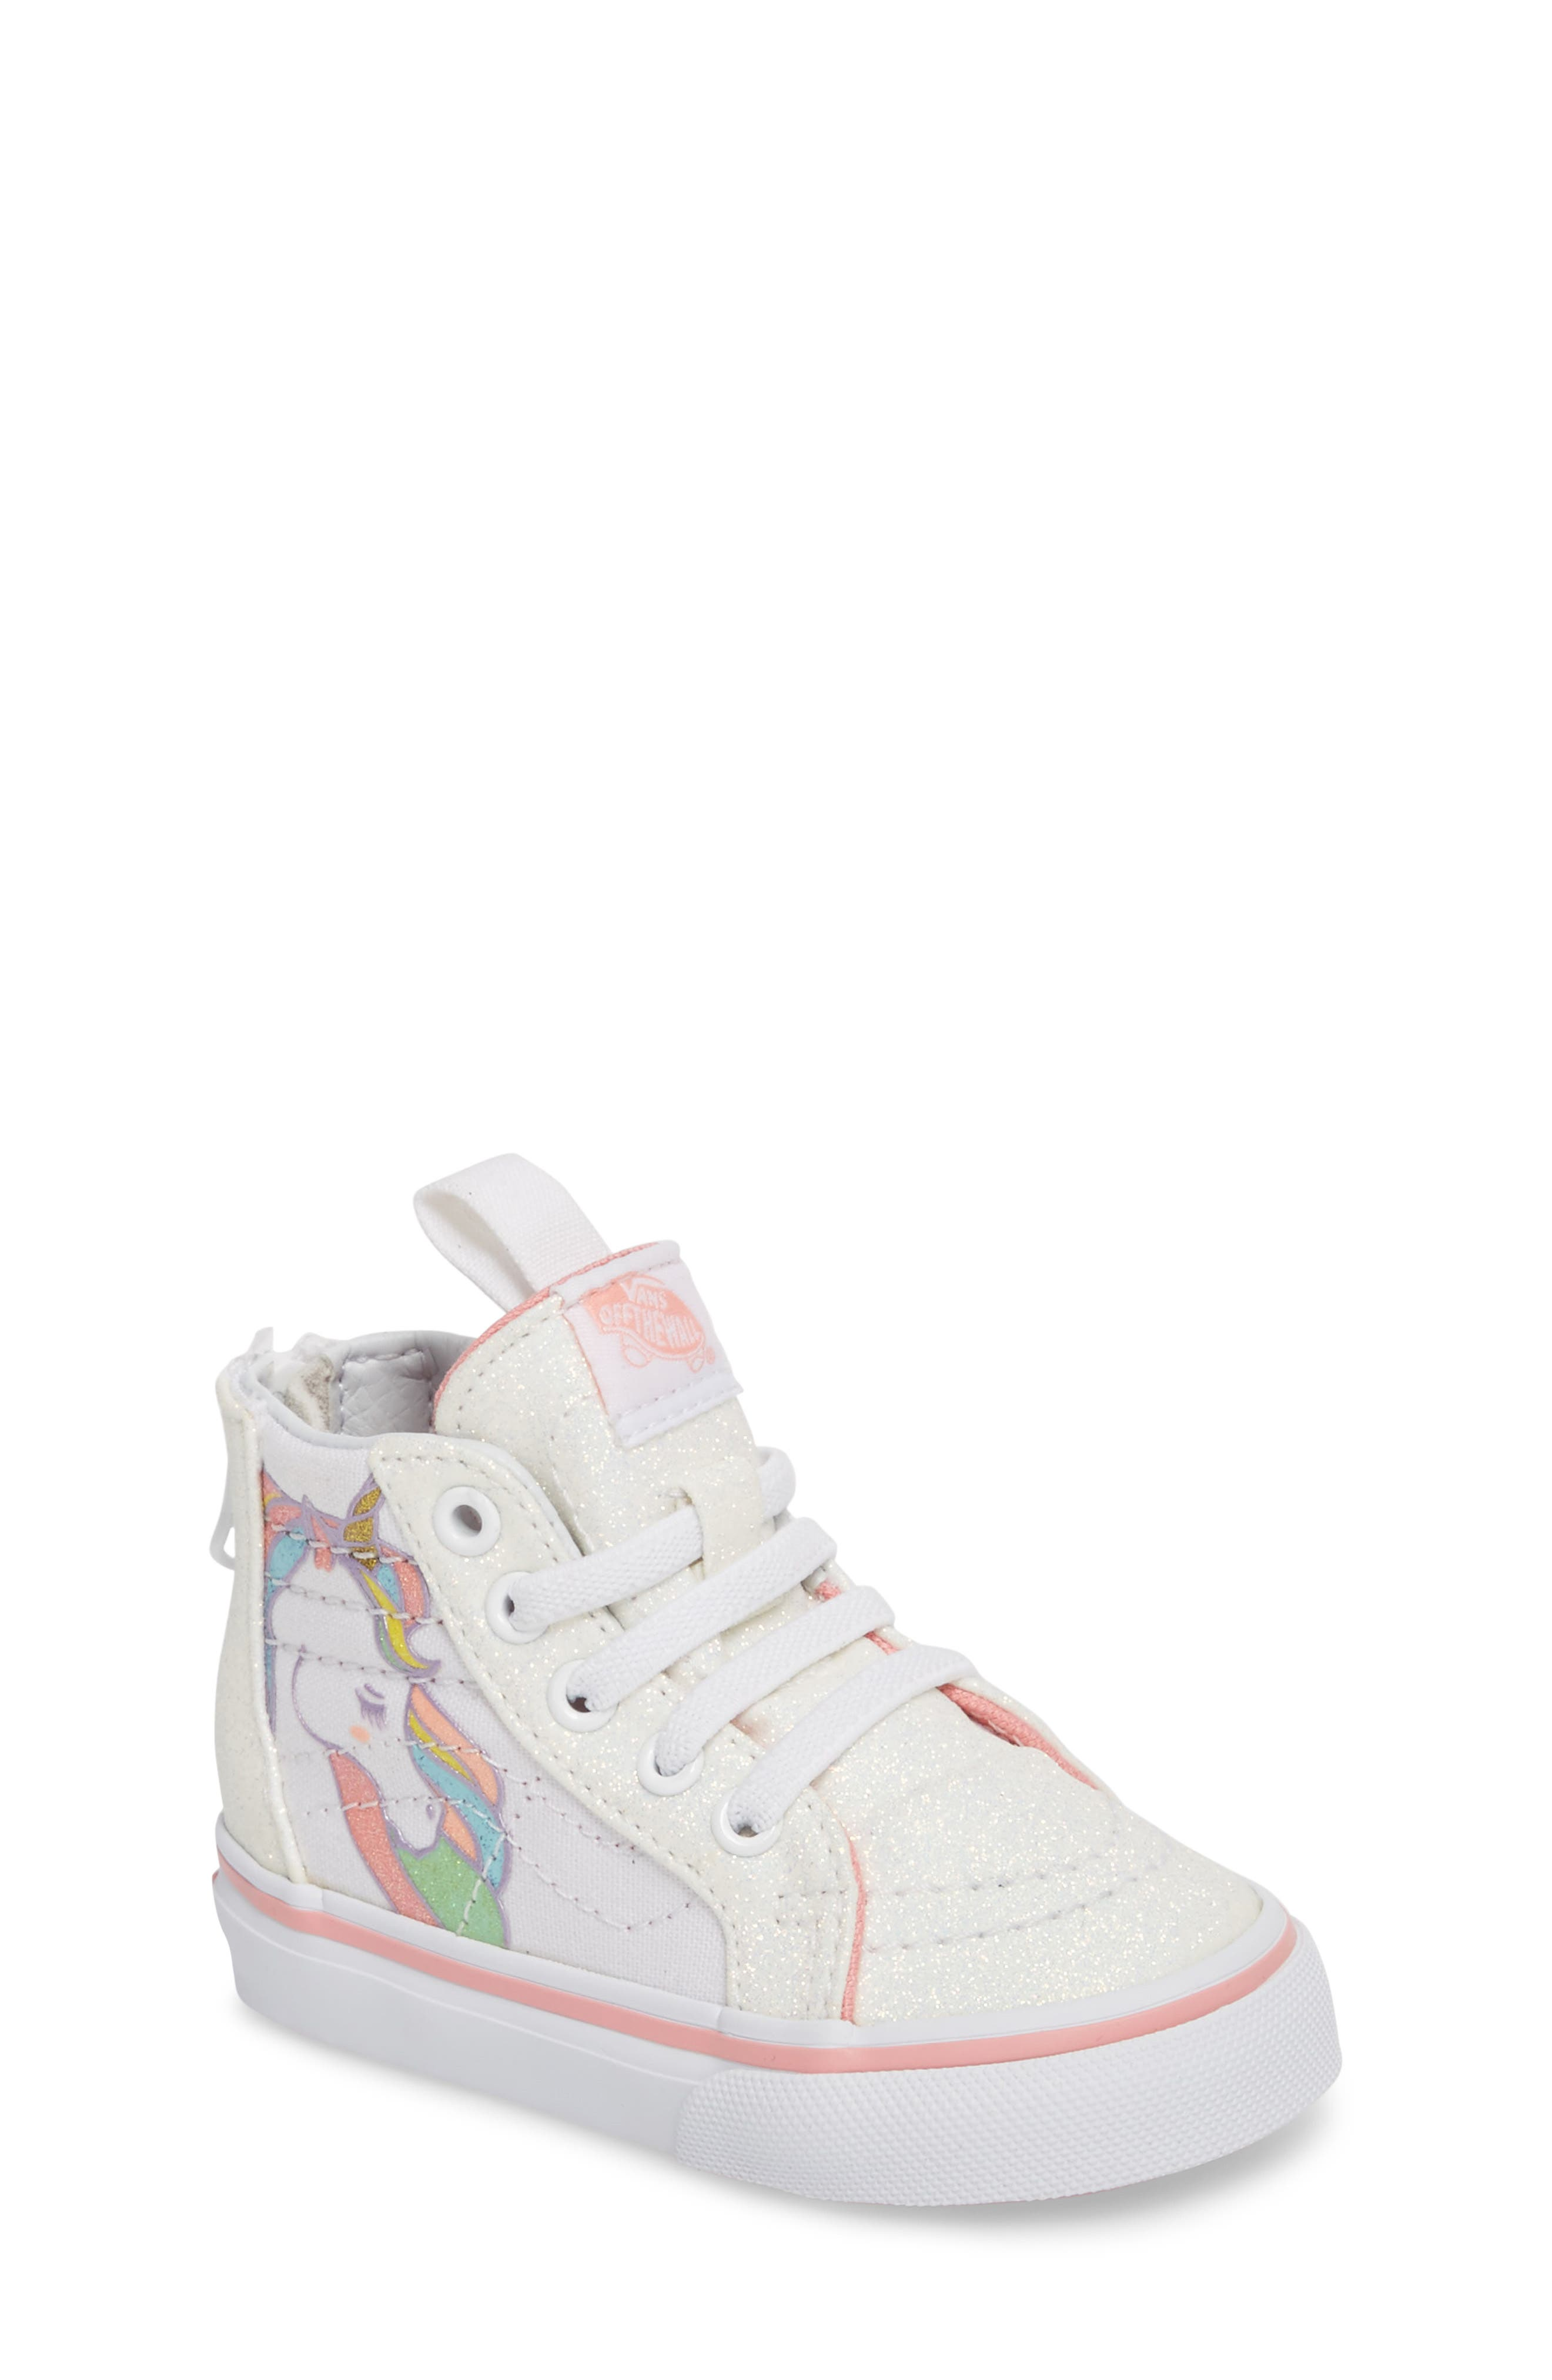 SK8-Hi Zip Glitter Unicorn Sneaker,                             Main thumbnail 1, color,